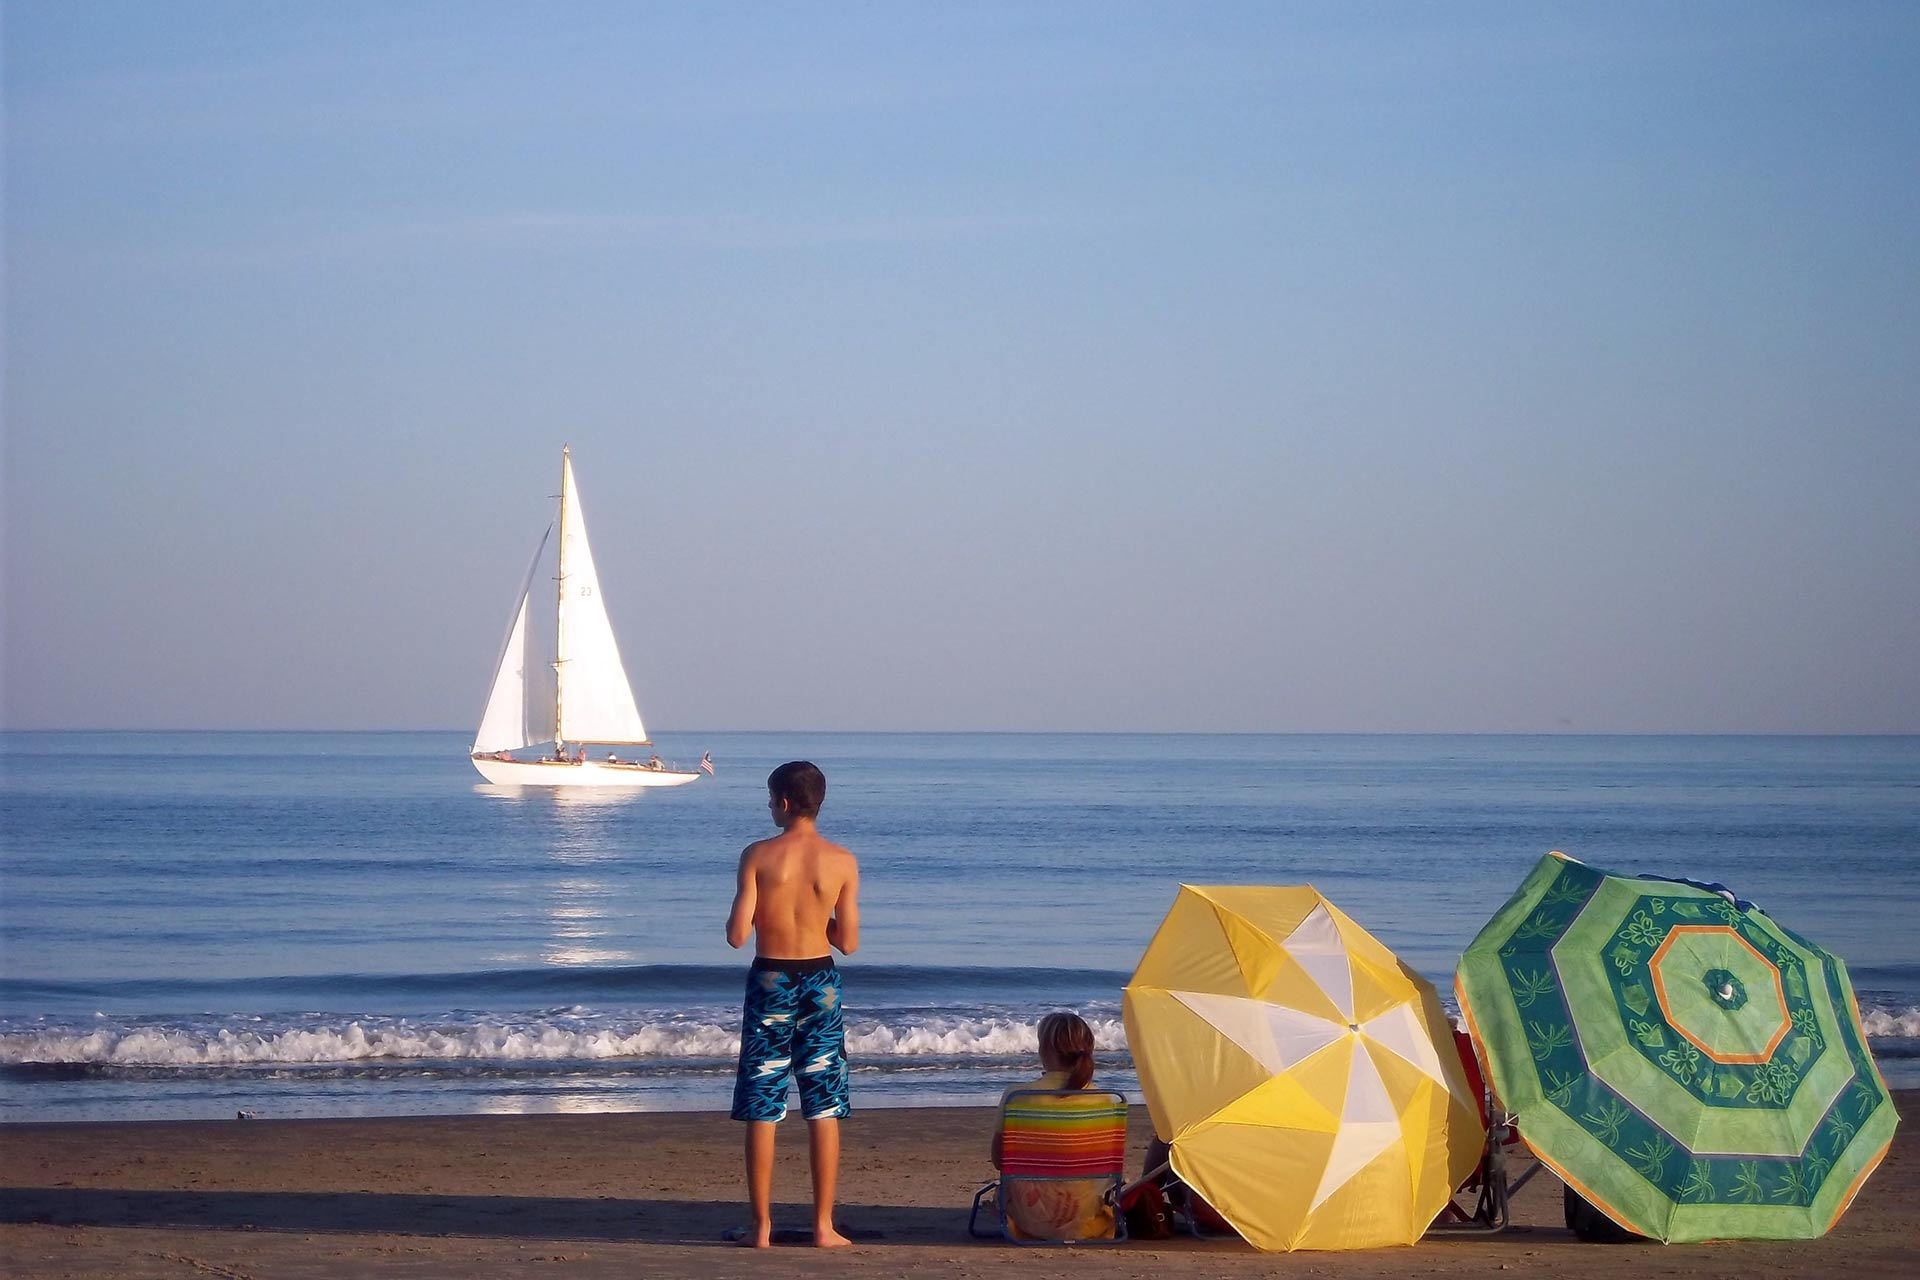 Wells Beach, Maine, USA